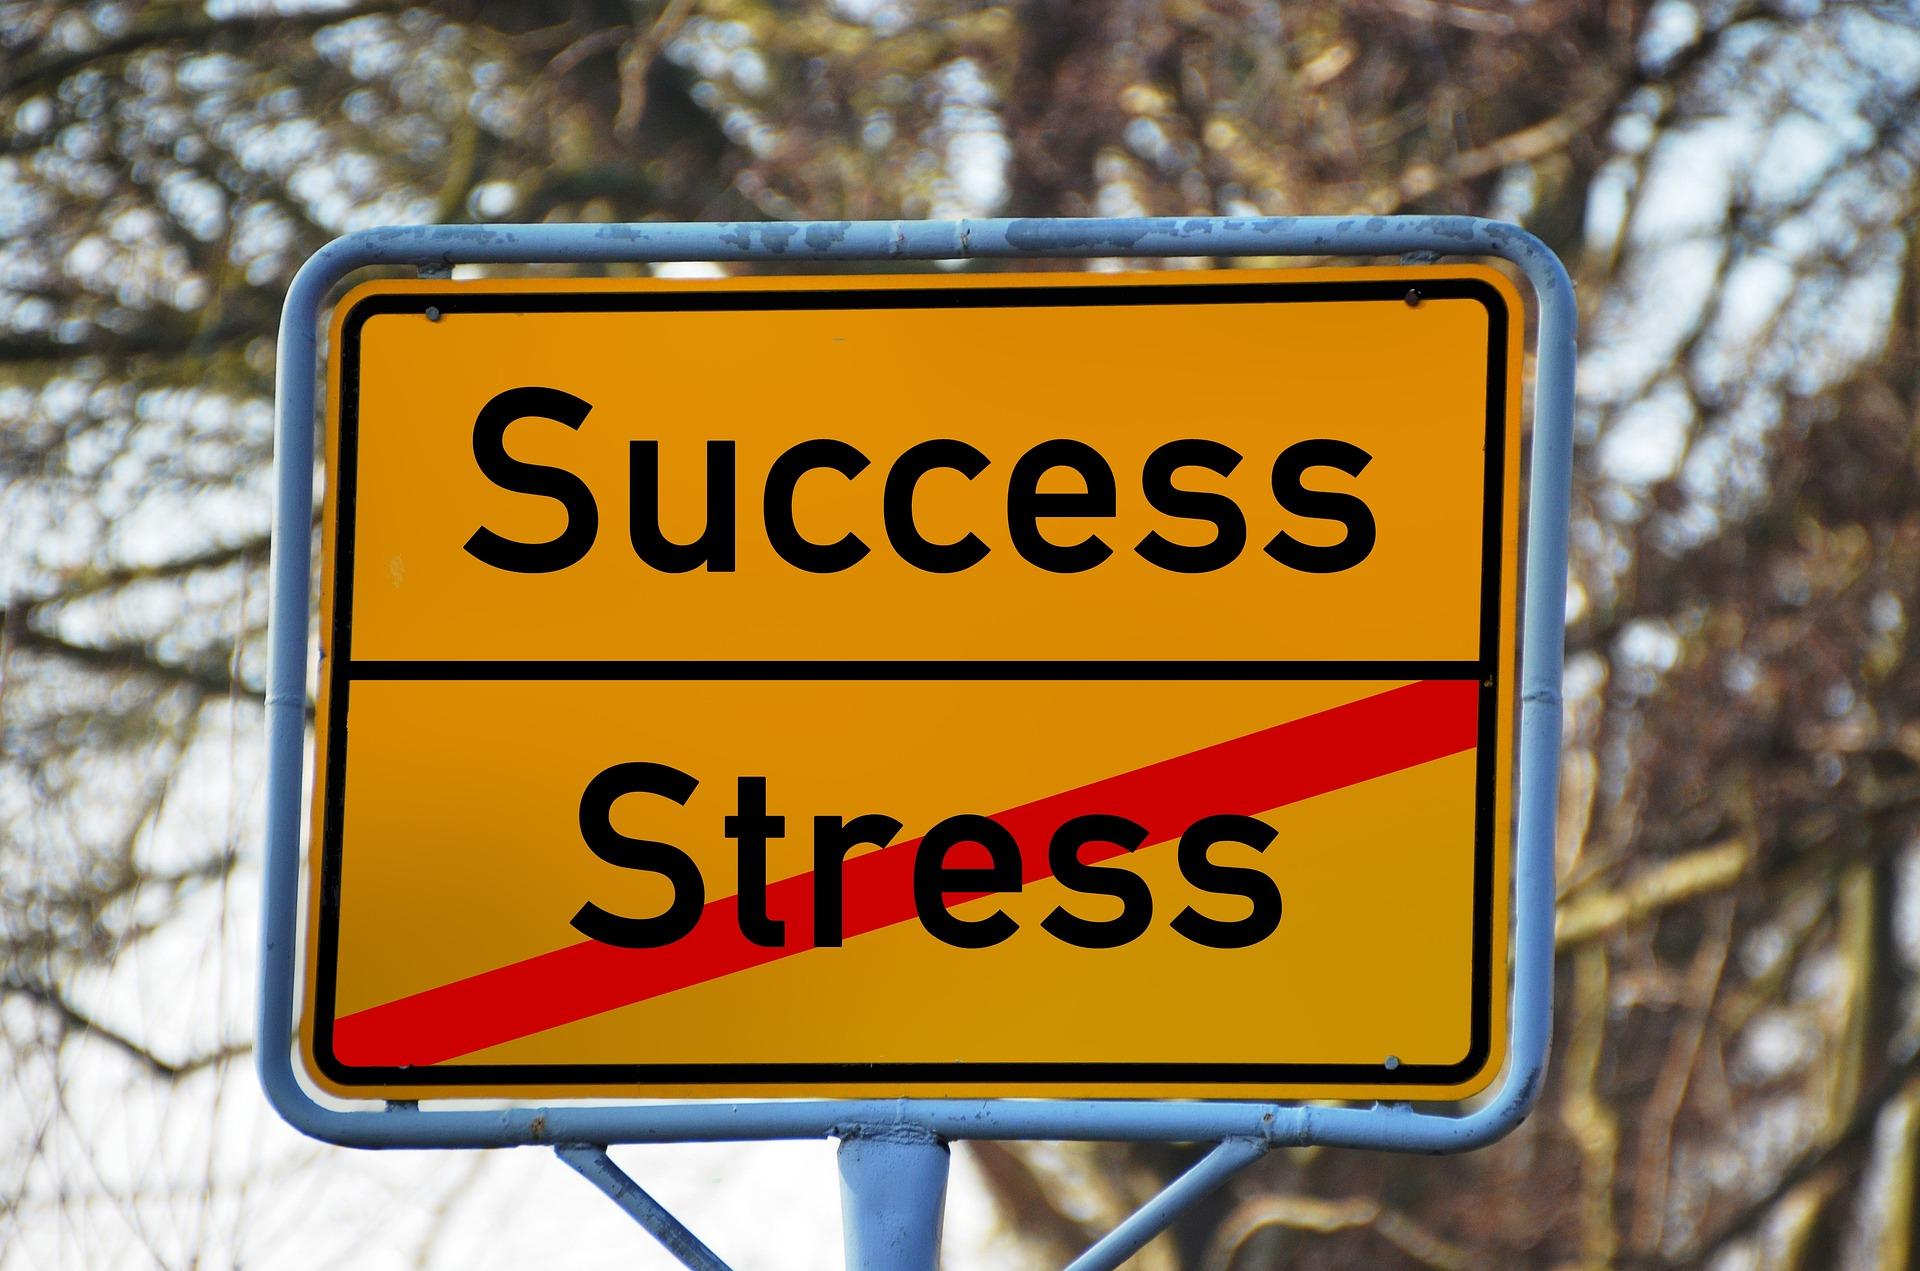 Epuizare la locul de munca? 5 semne principale de sindrom burnout la medicii specialisti